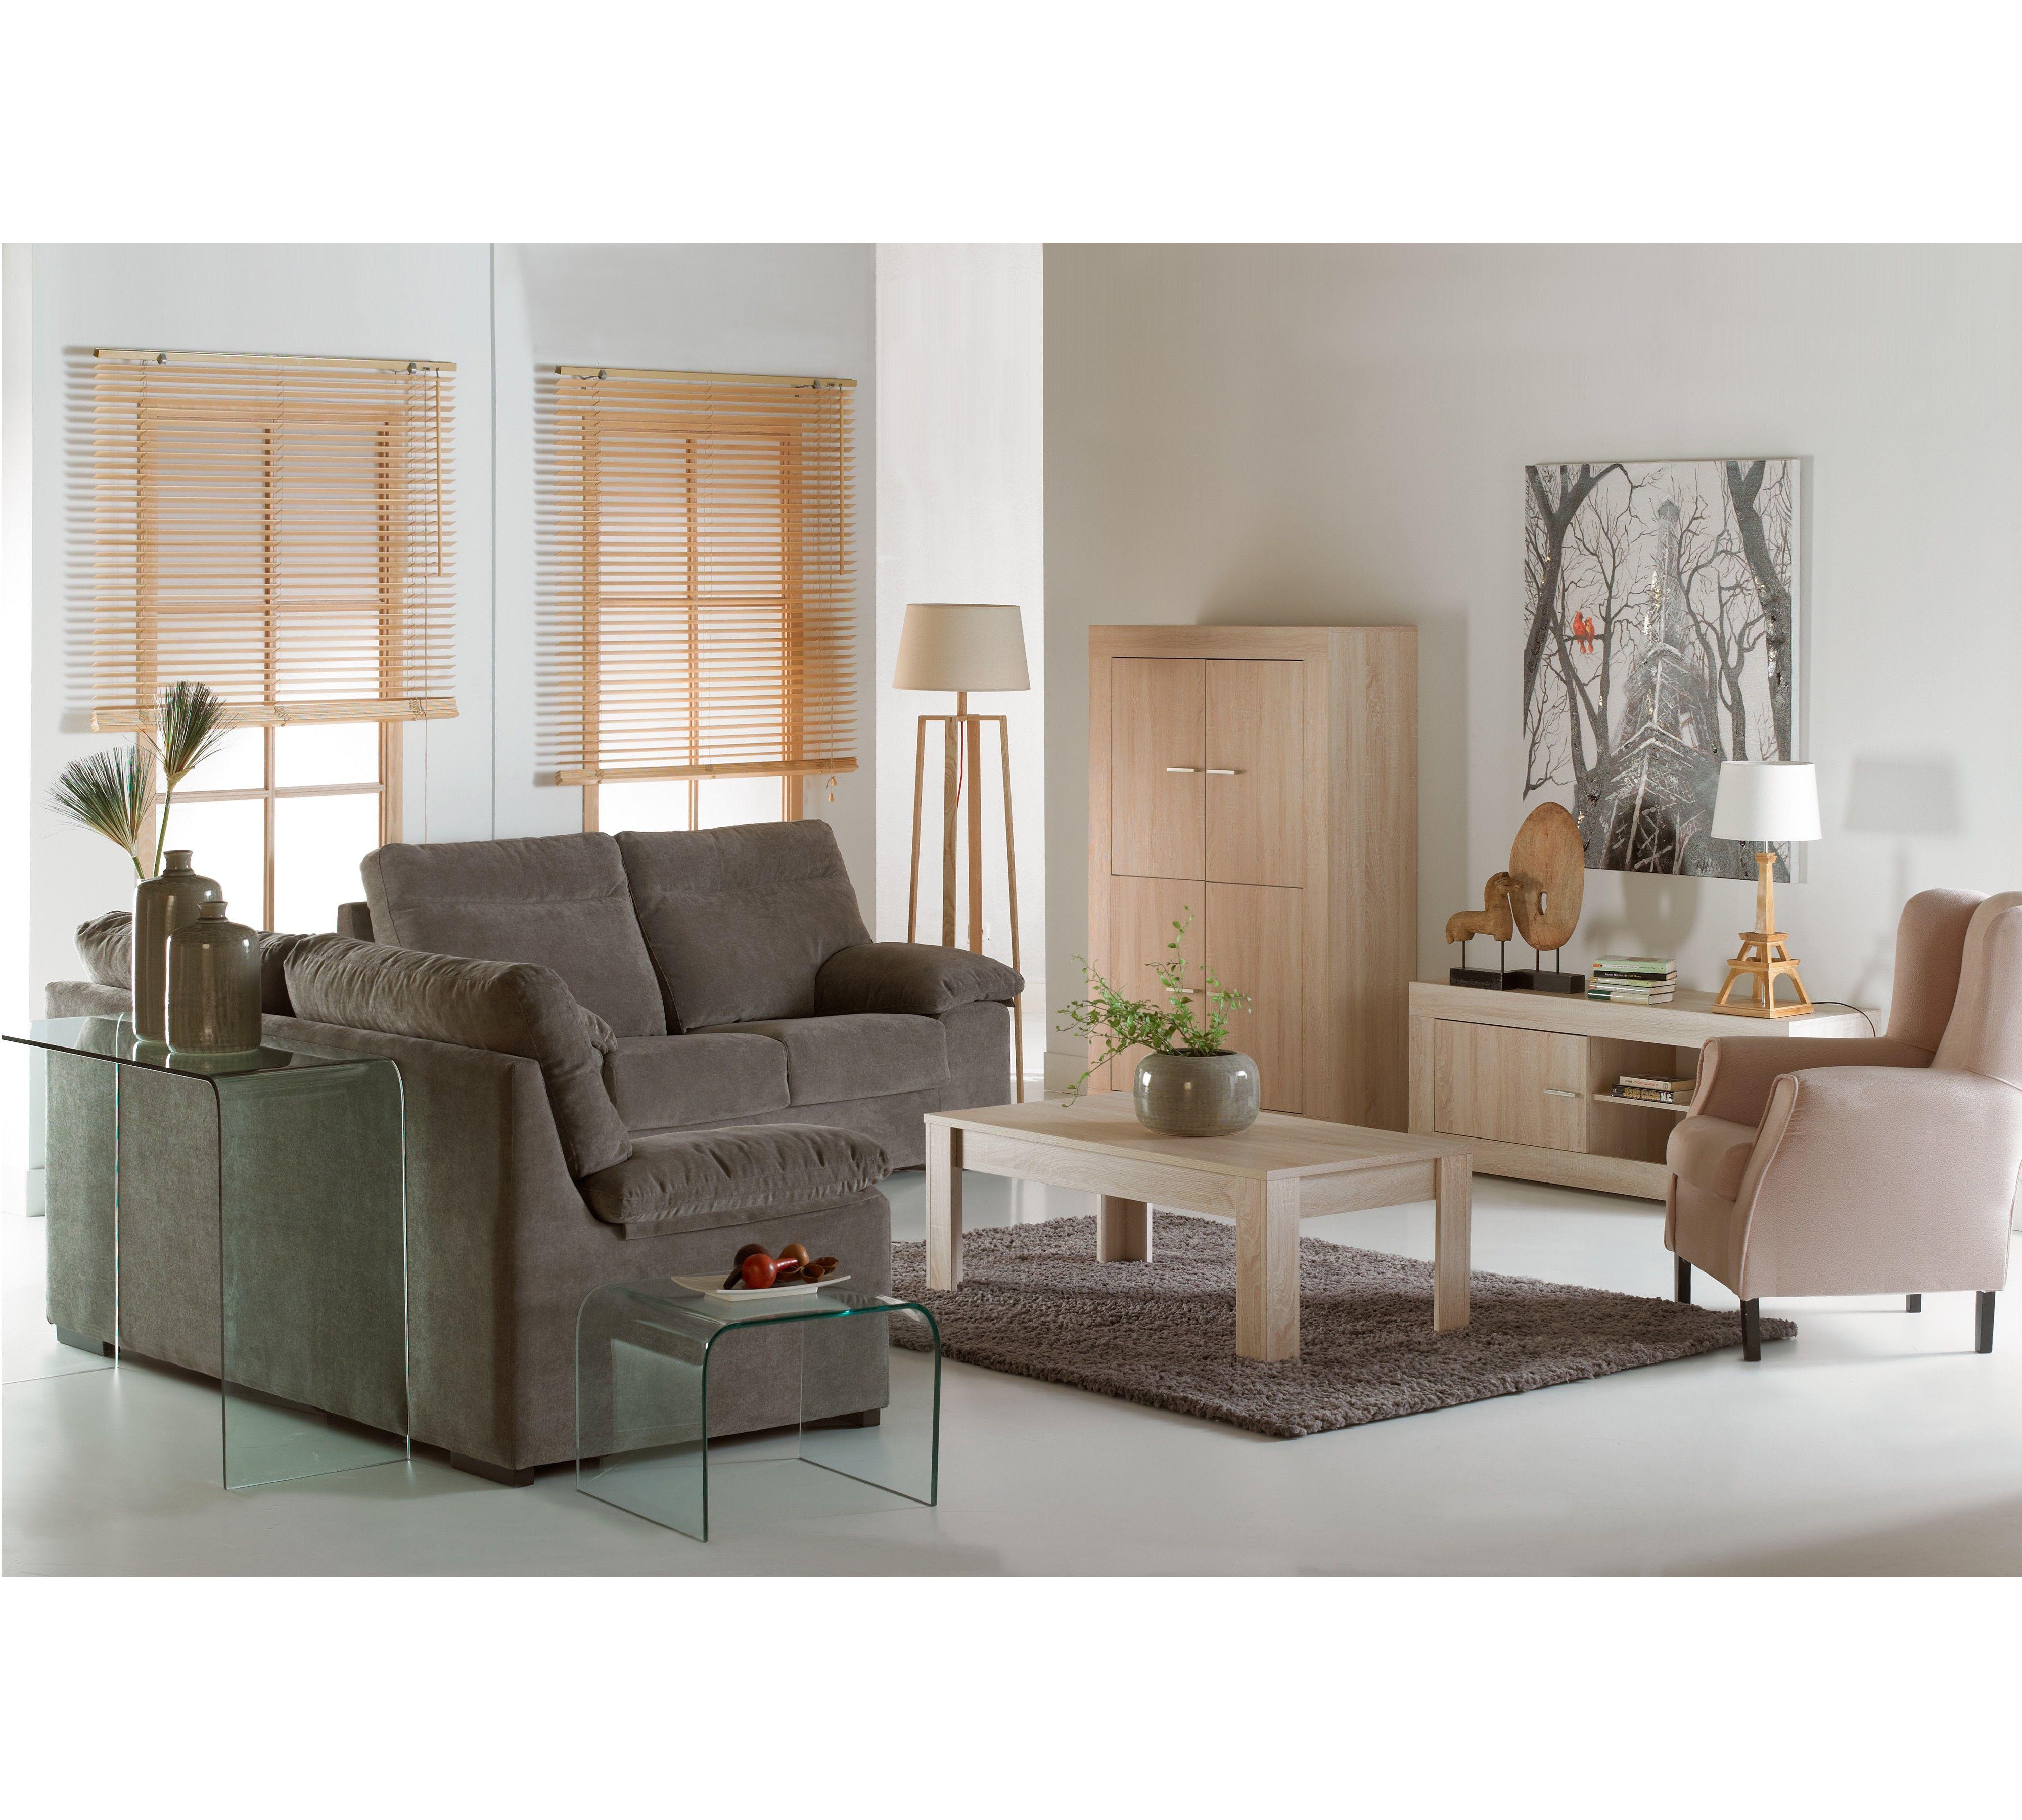 Mueble tv modelo Rústica - Camino a Casa